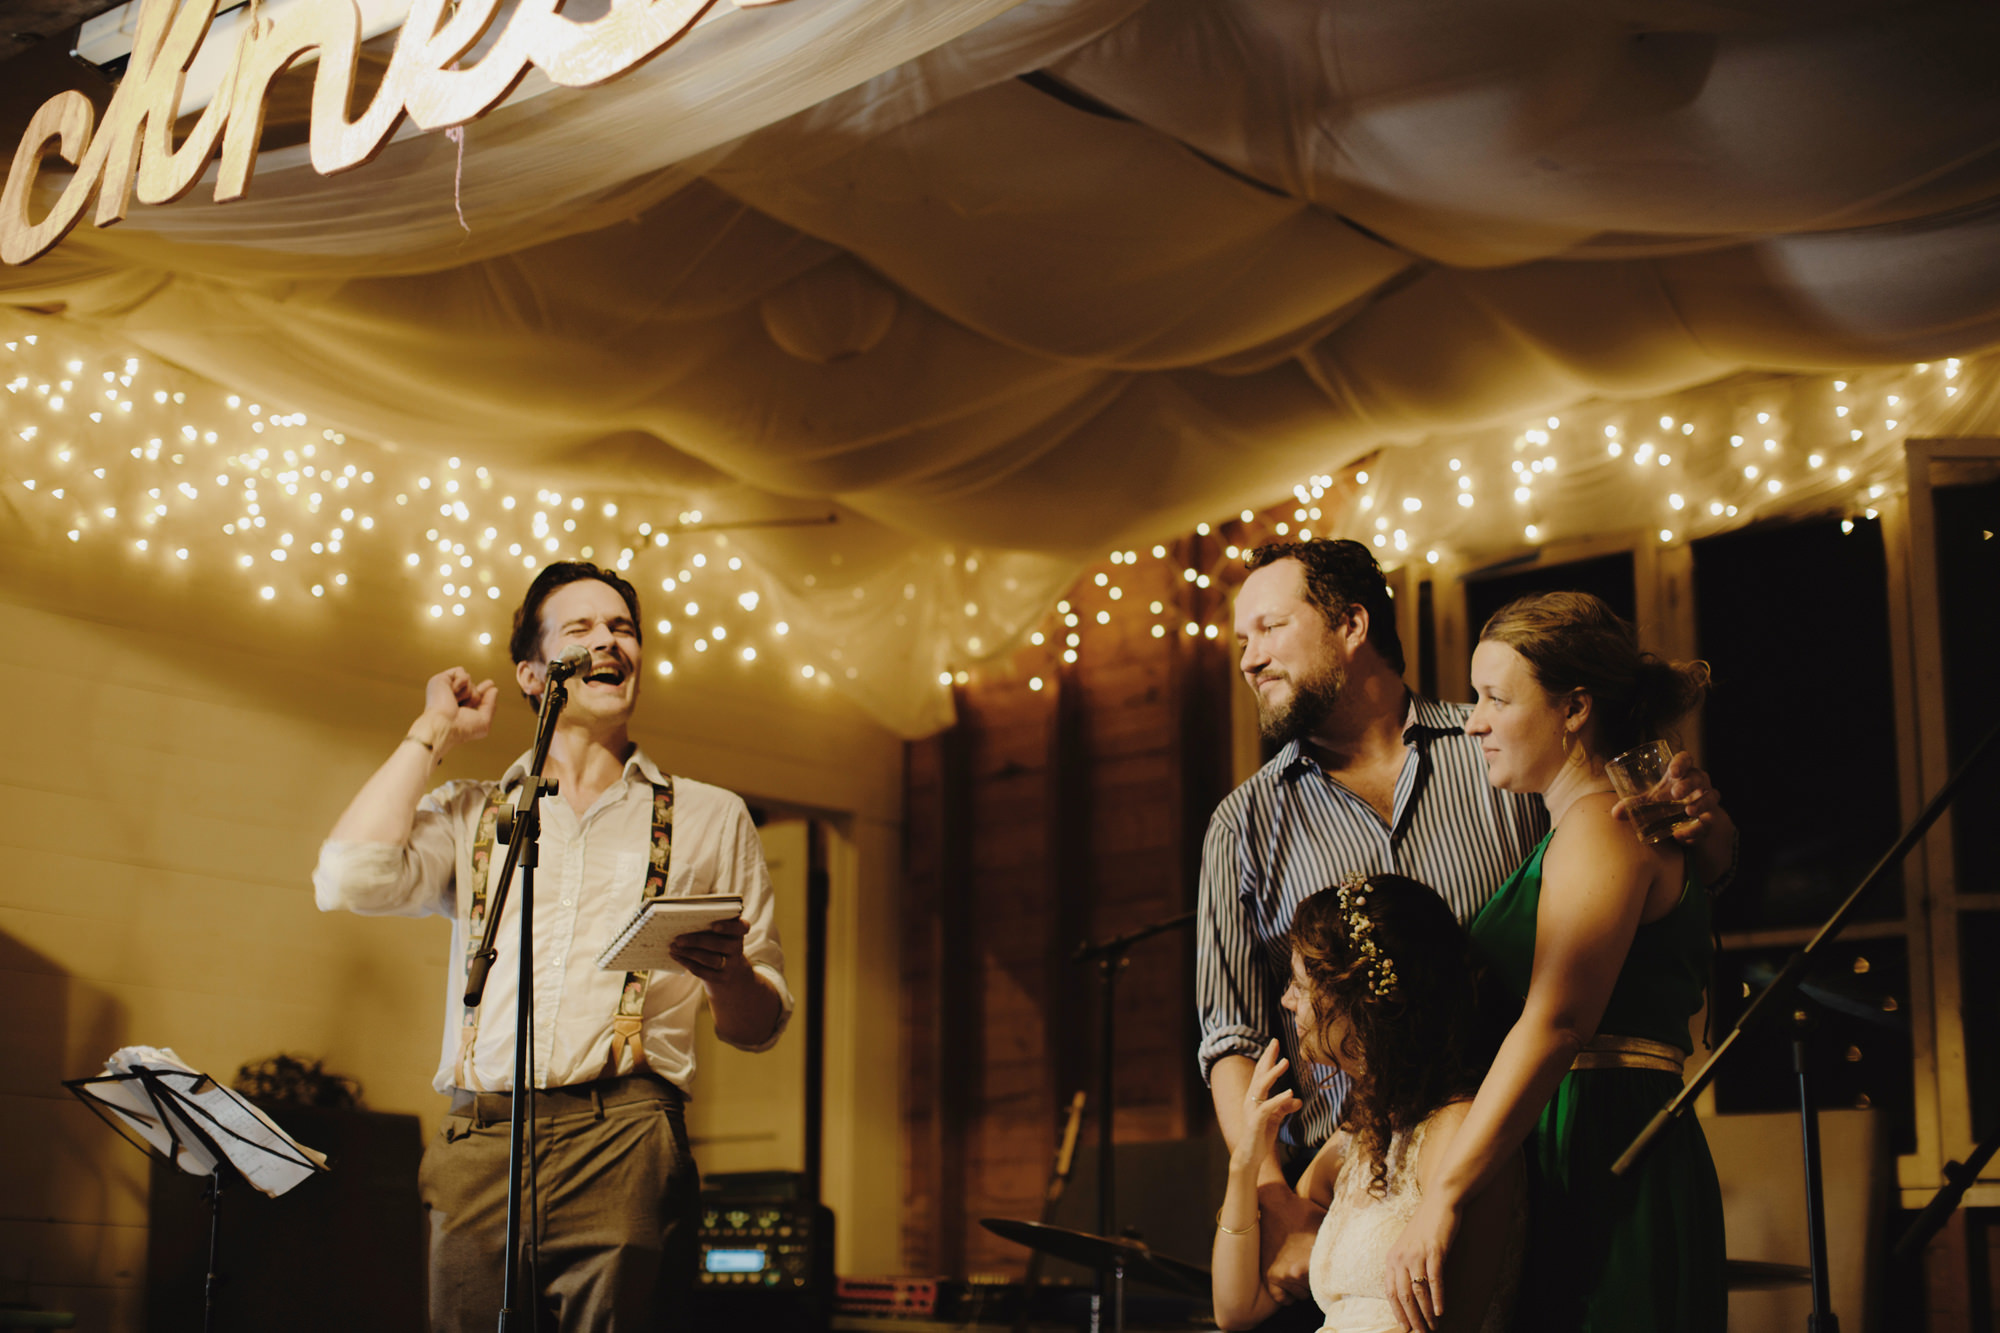 catskills_big_indian_springs_upstate_NY_wedding_sammblake154.jpg